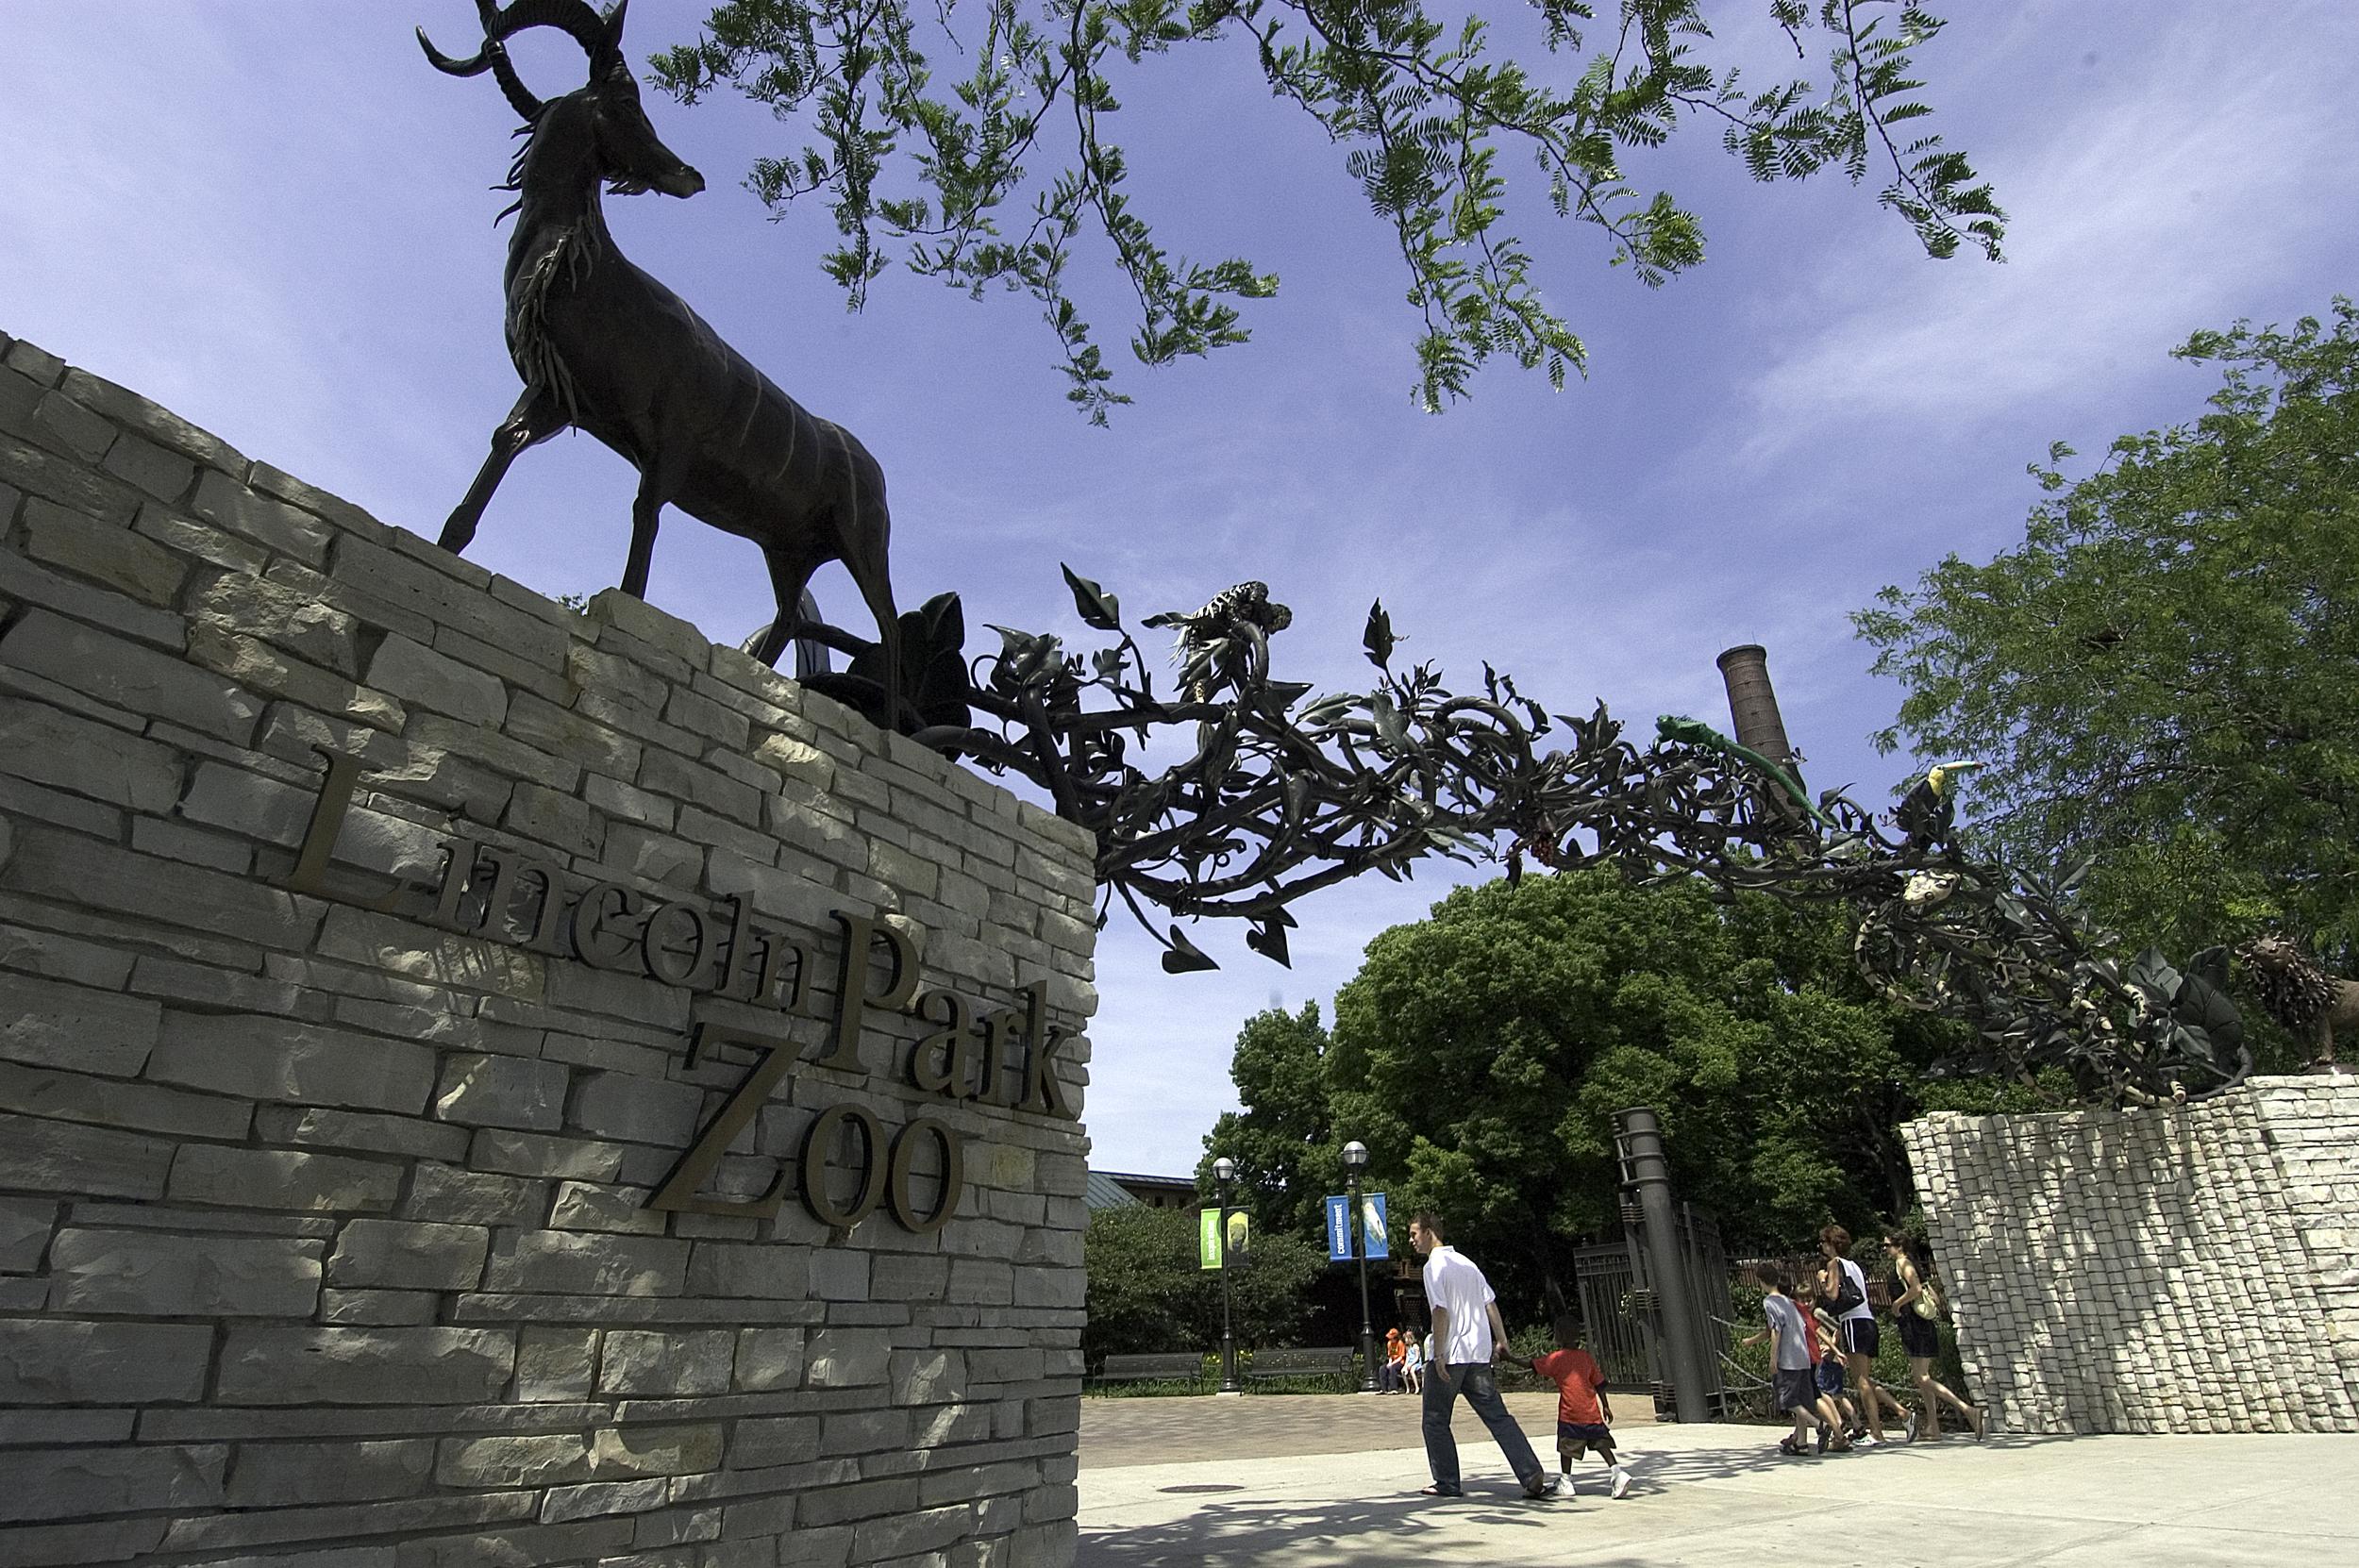 photo via  Lincoln Park Zoo